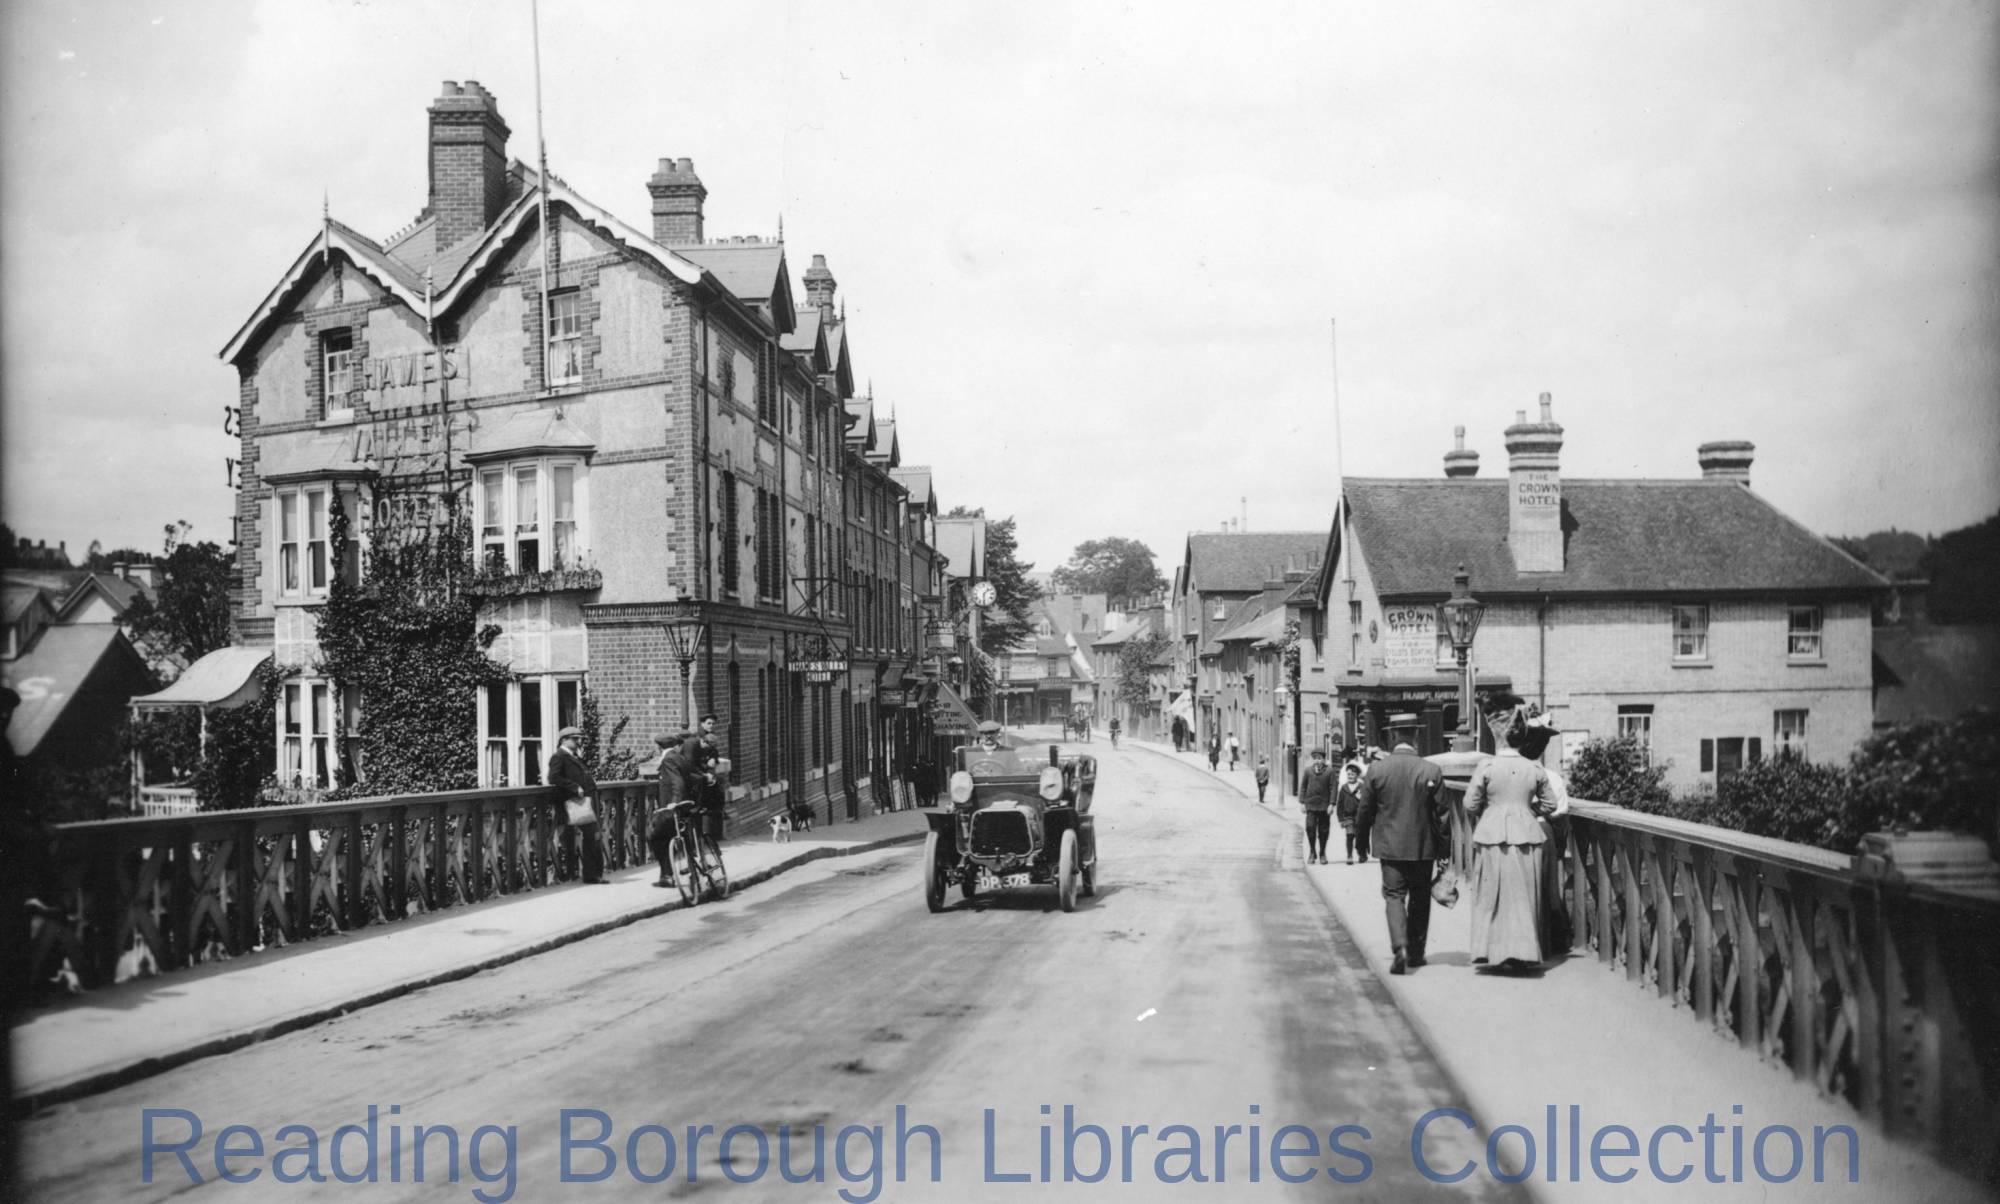 Bridge Street, Caversham, looking northwards from Caversham Bridge, 1908